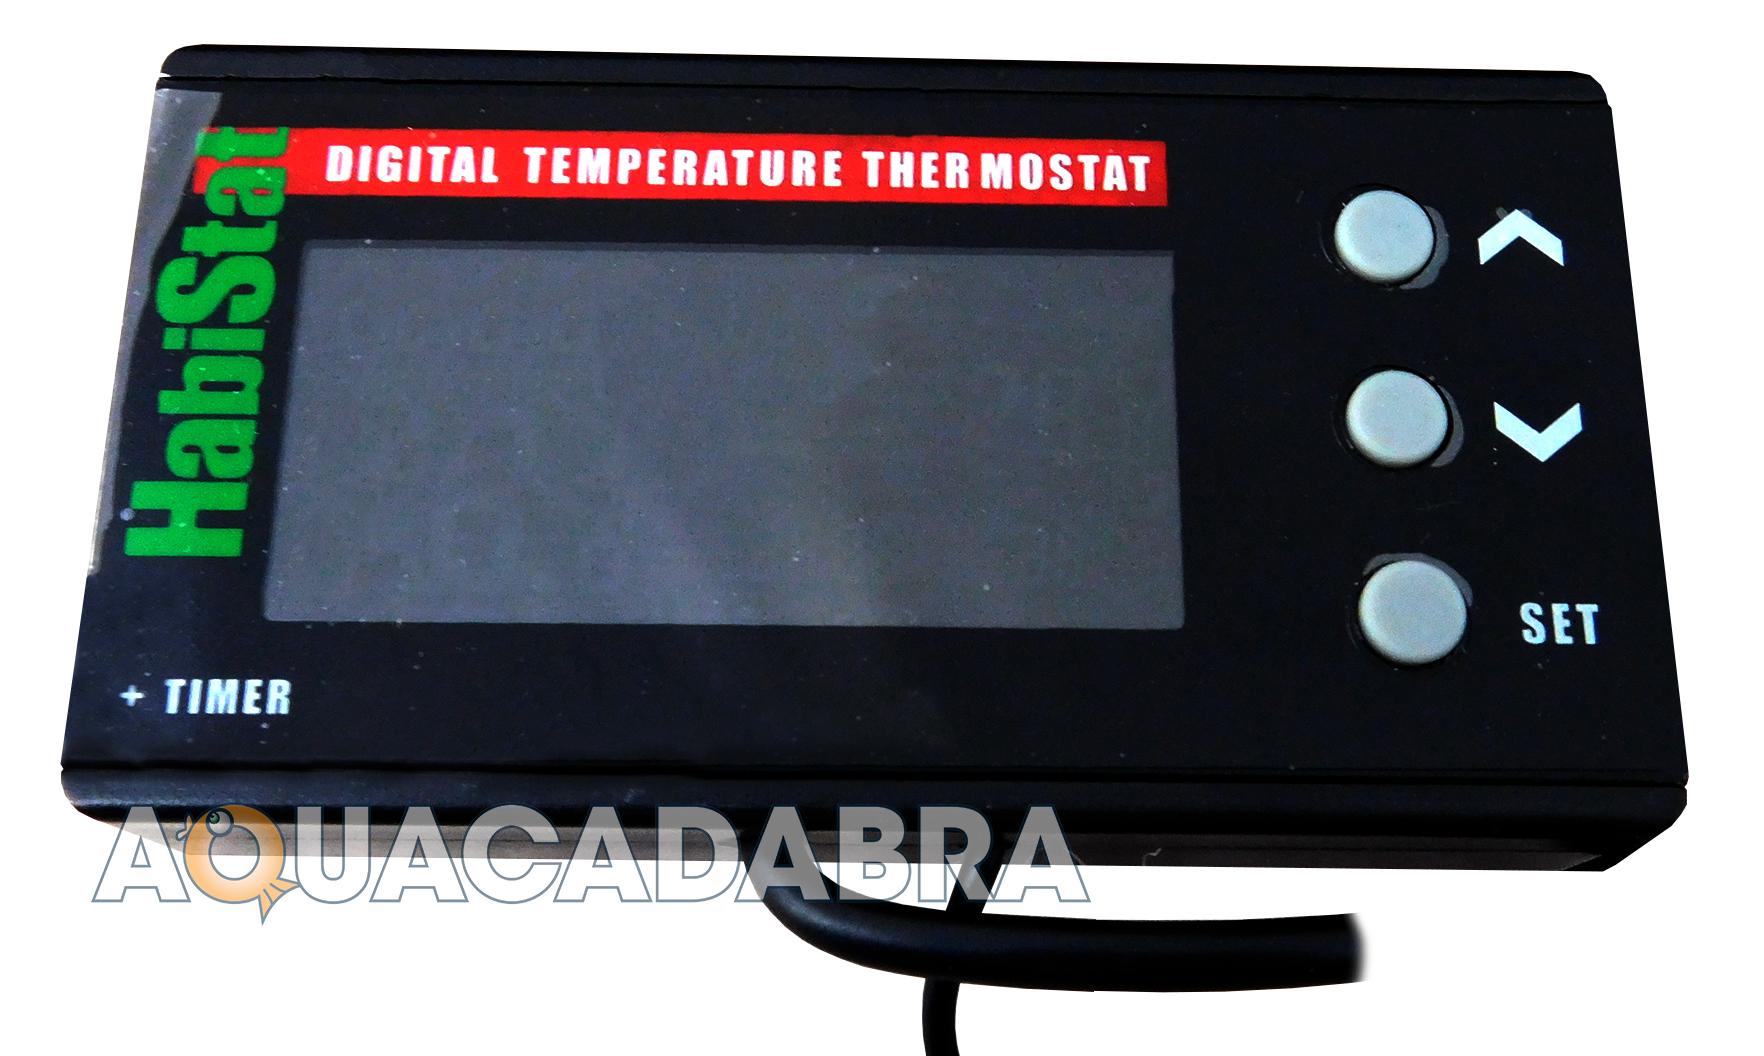 Habistat Digital Thermostats Heater Temperature Day Night